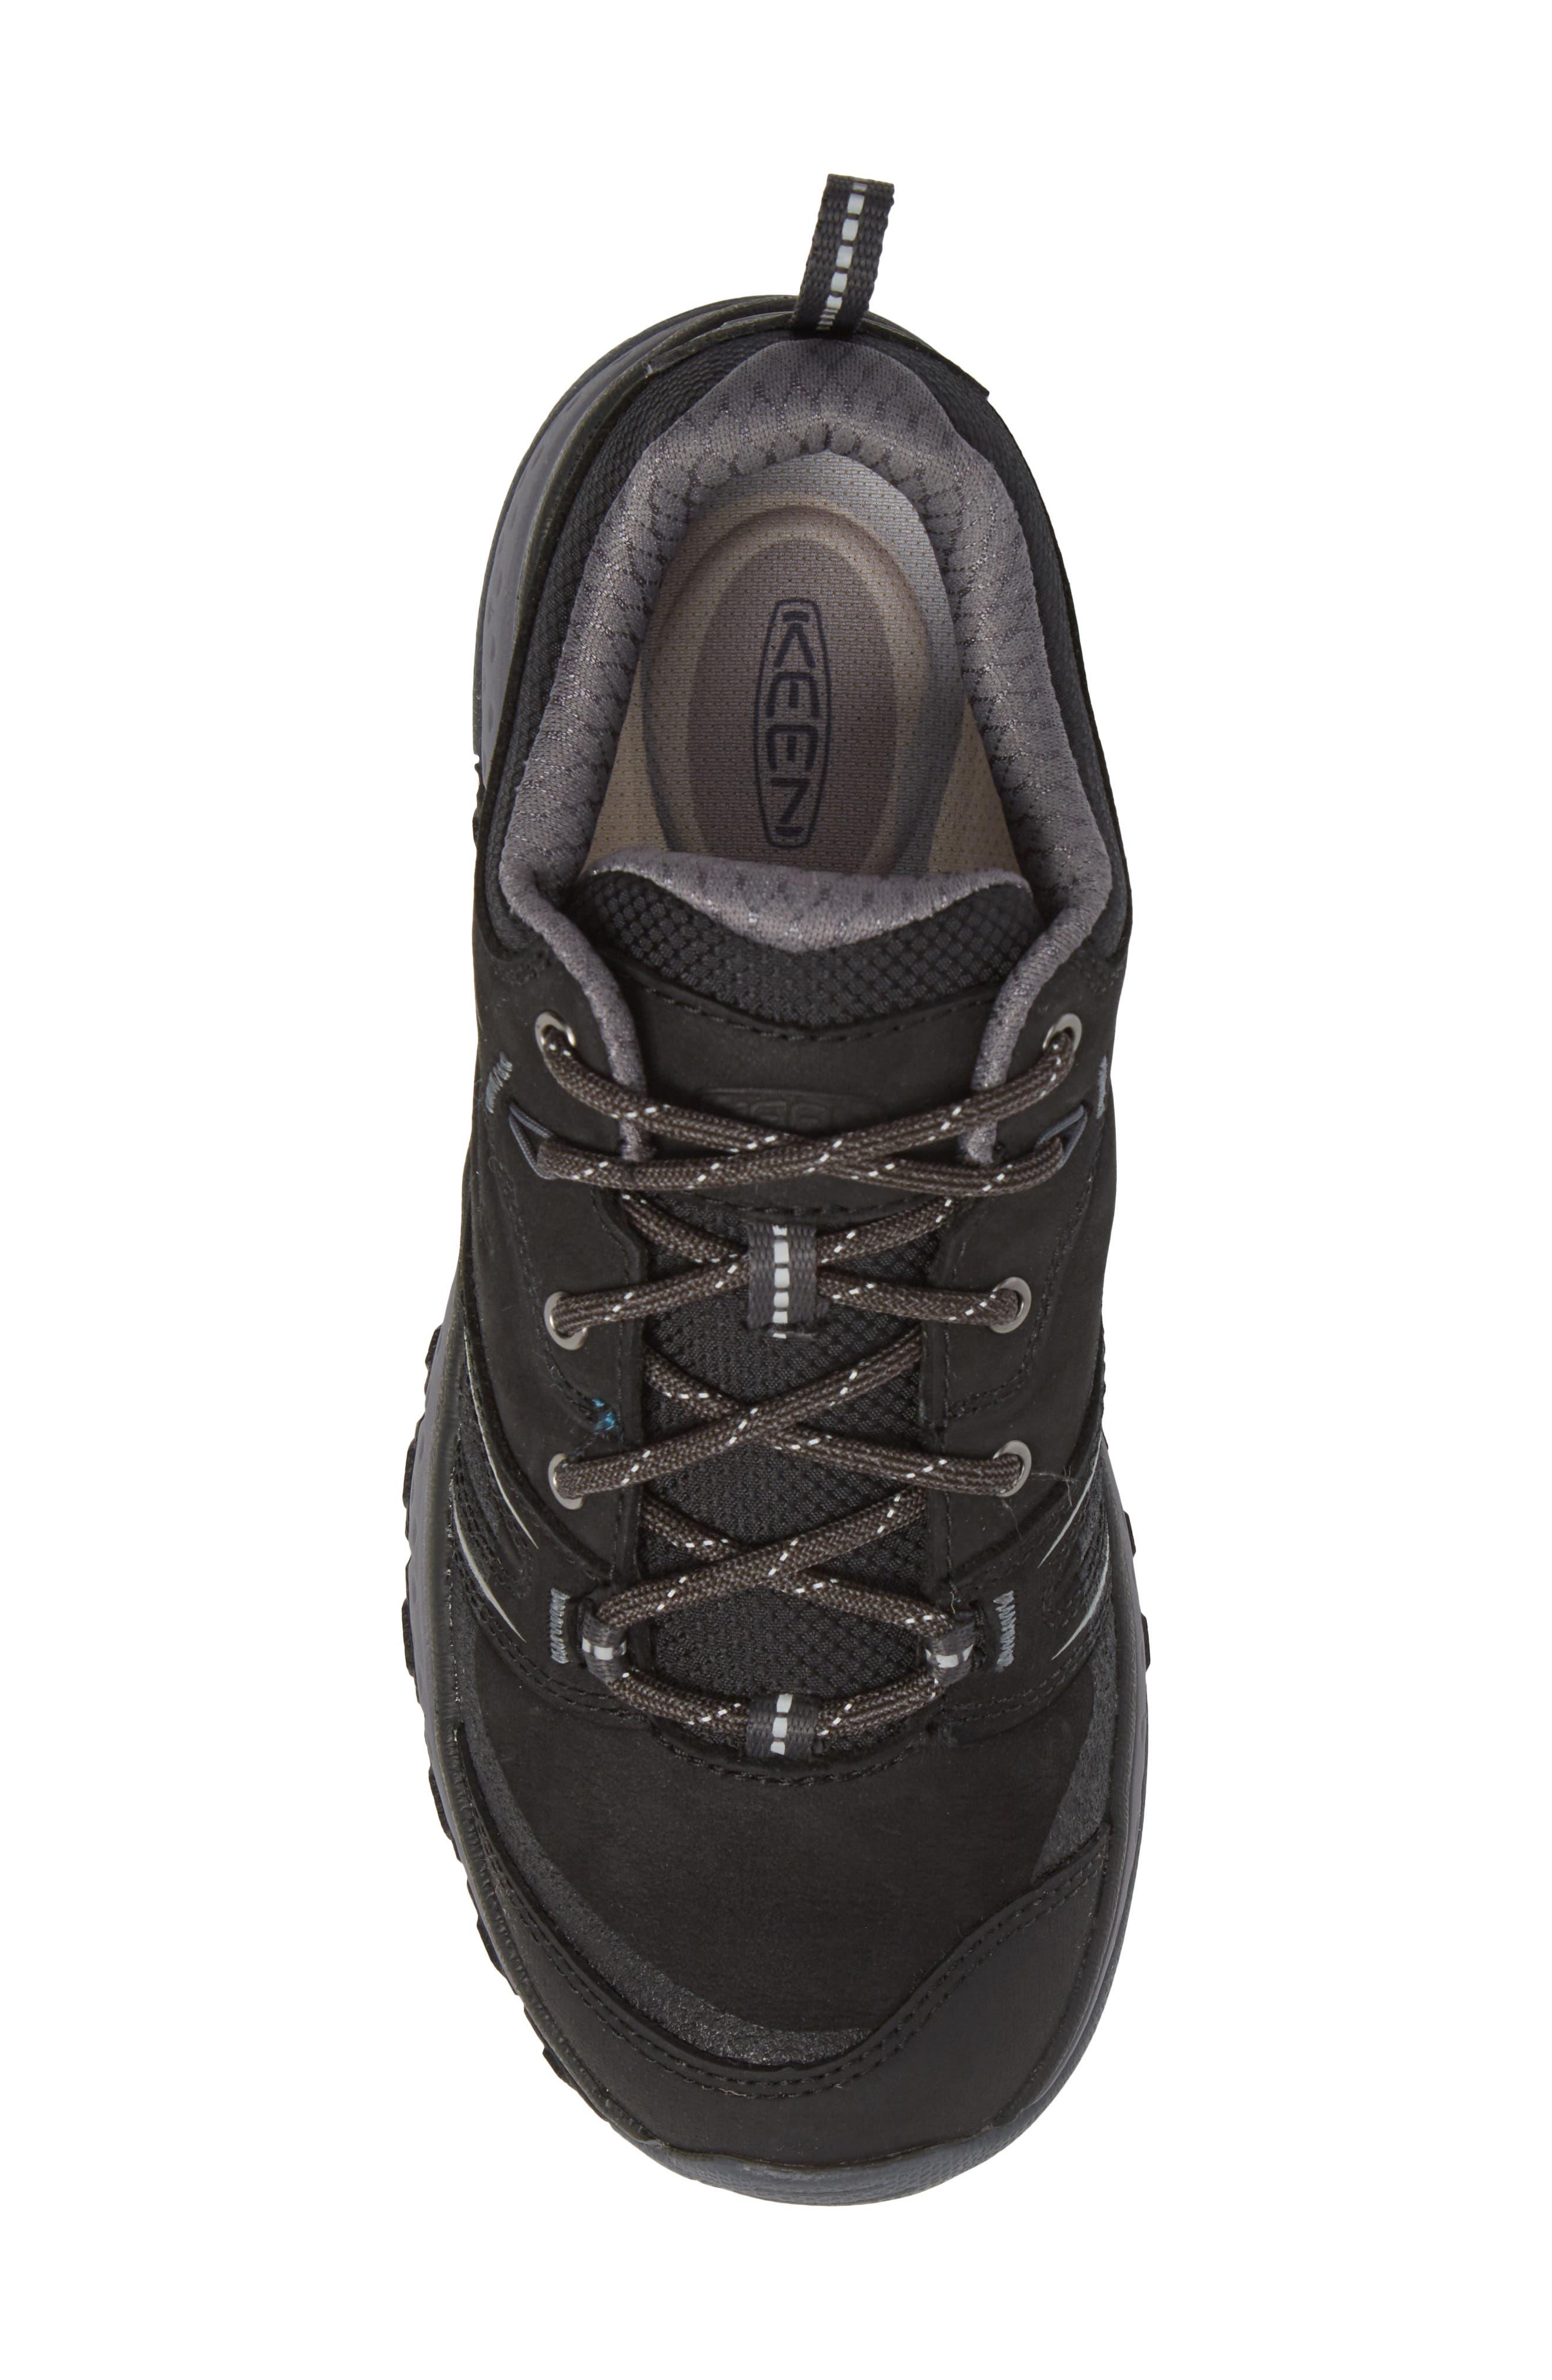 Terradora Waterproof Hiking Shoe,                             Alternate thumbnail 5, color,                             Black/ Steel Grey Nubuck